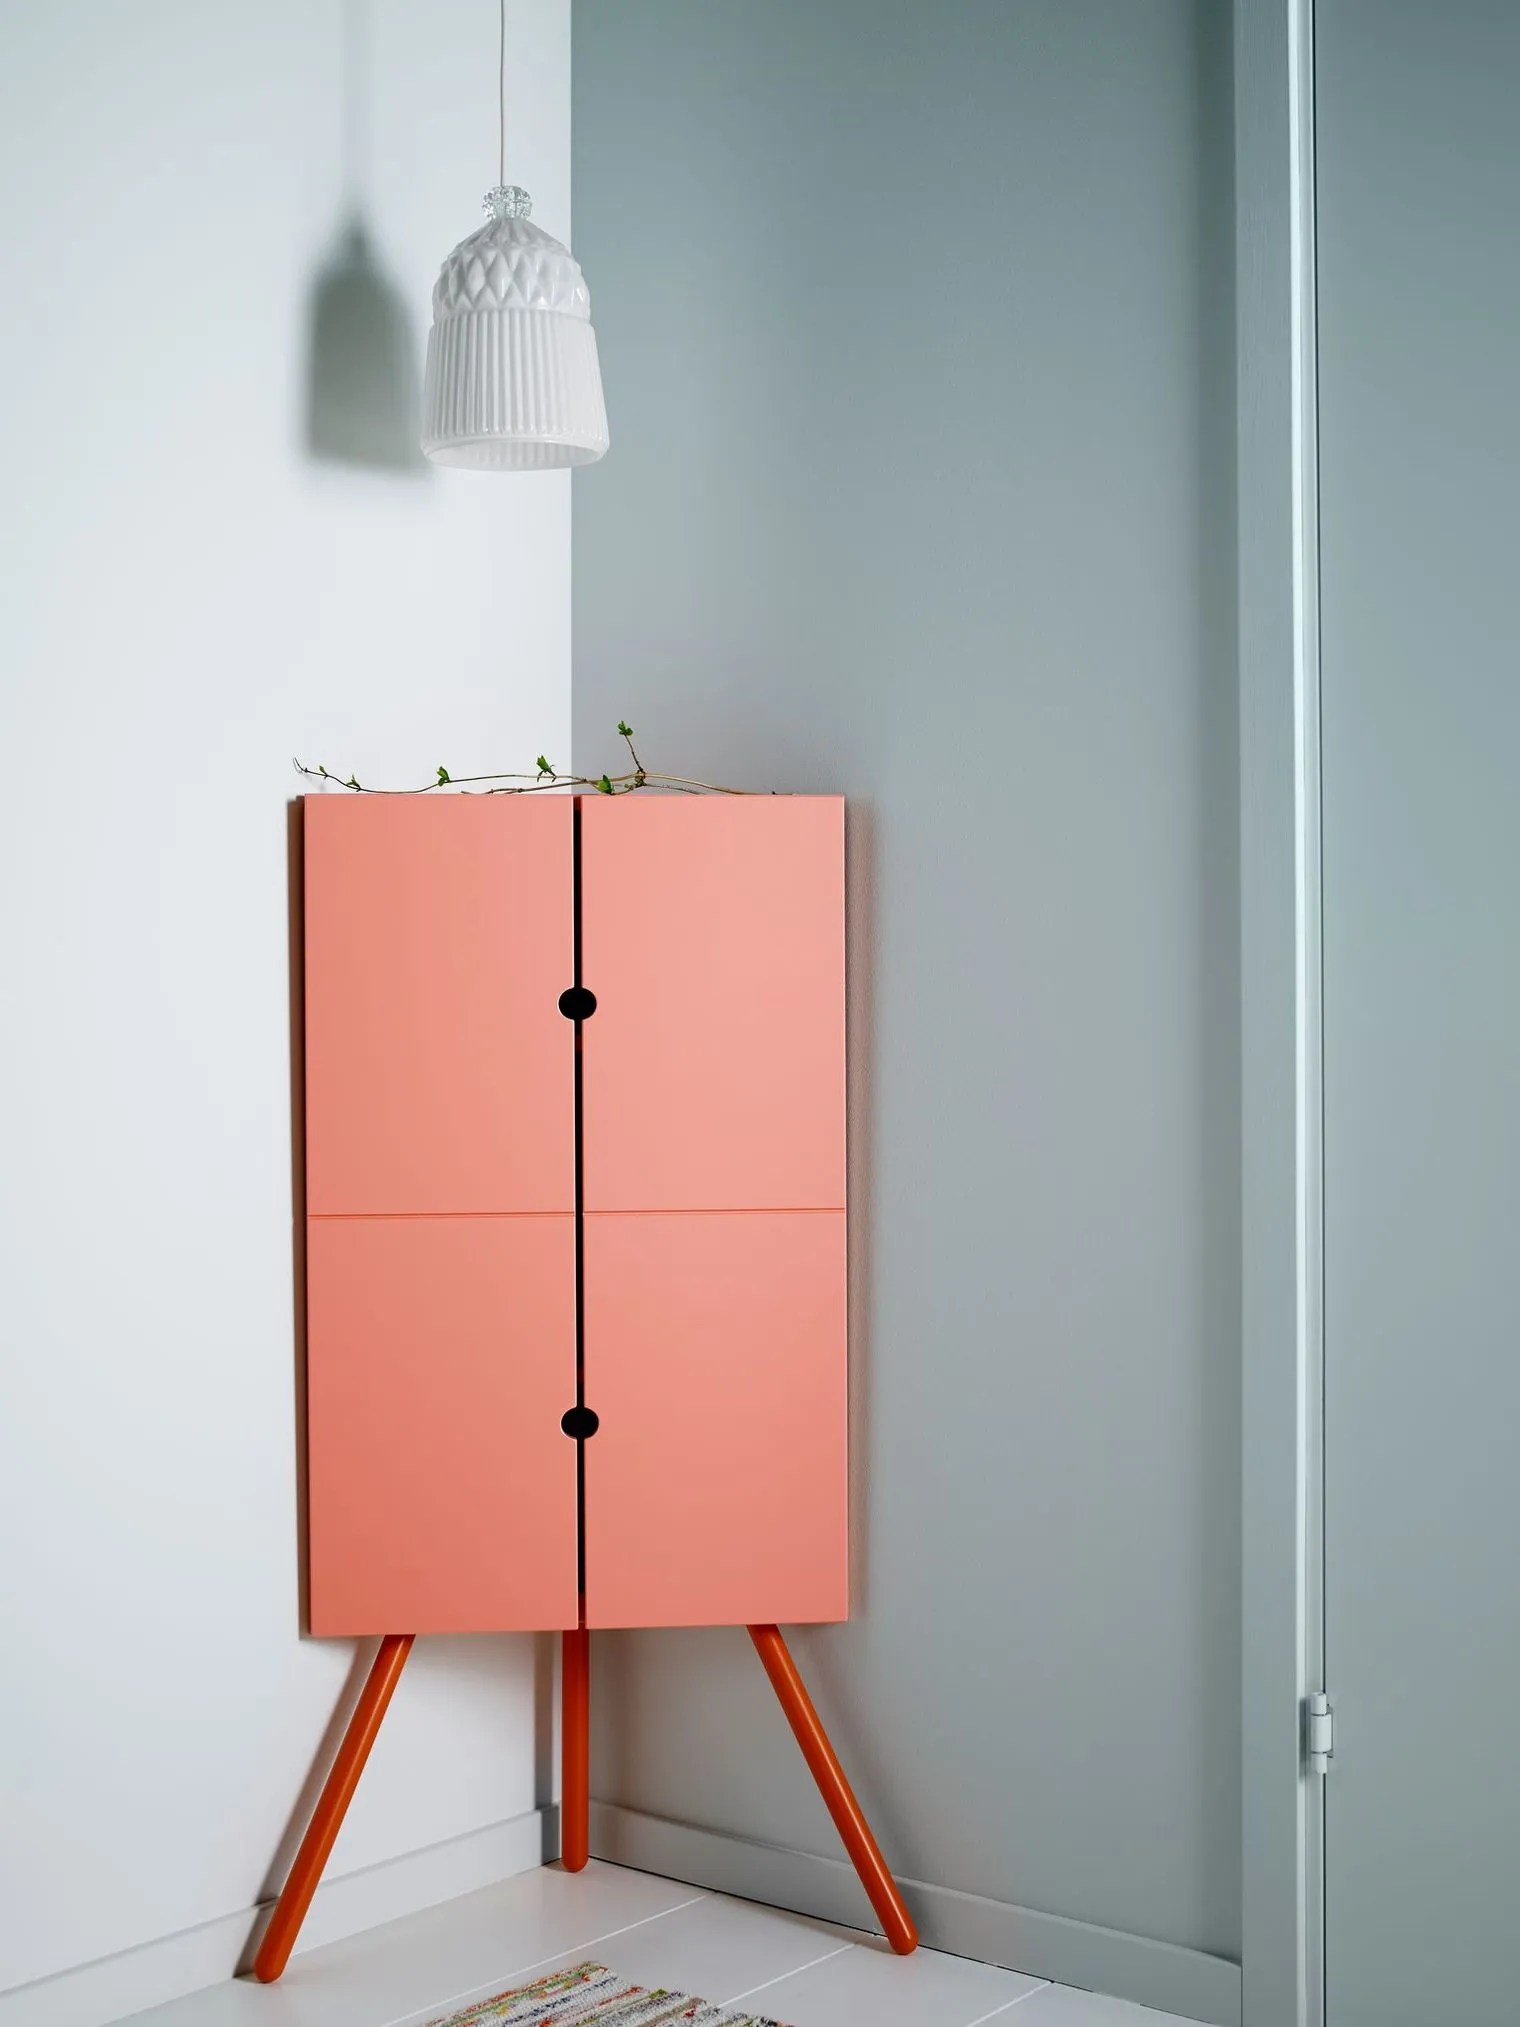 Bureau D Angle Ika Bureau D Angle Ika With Bureau D Angle Ika  # Meuble D'Angle Ikea Rose